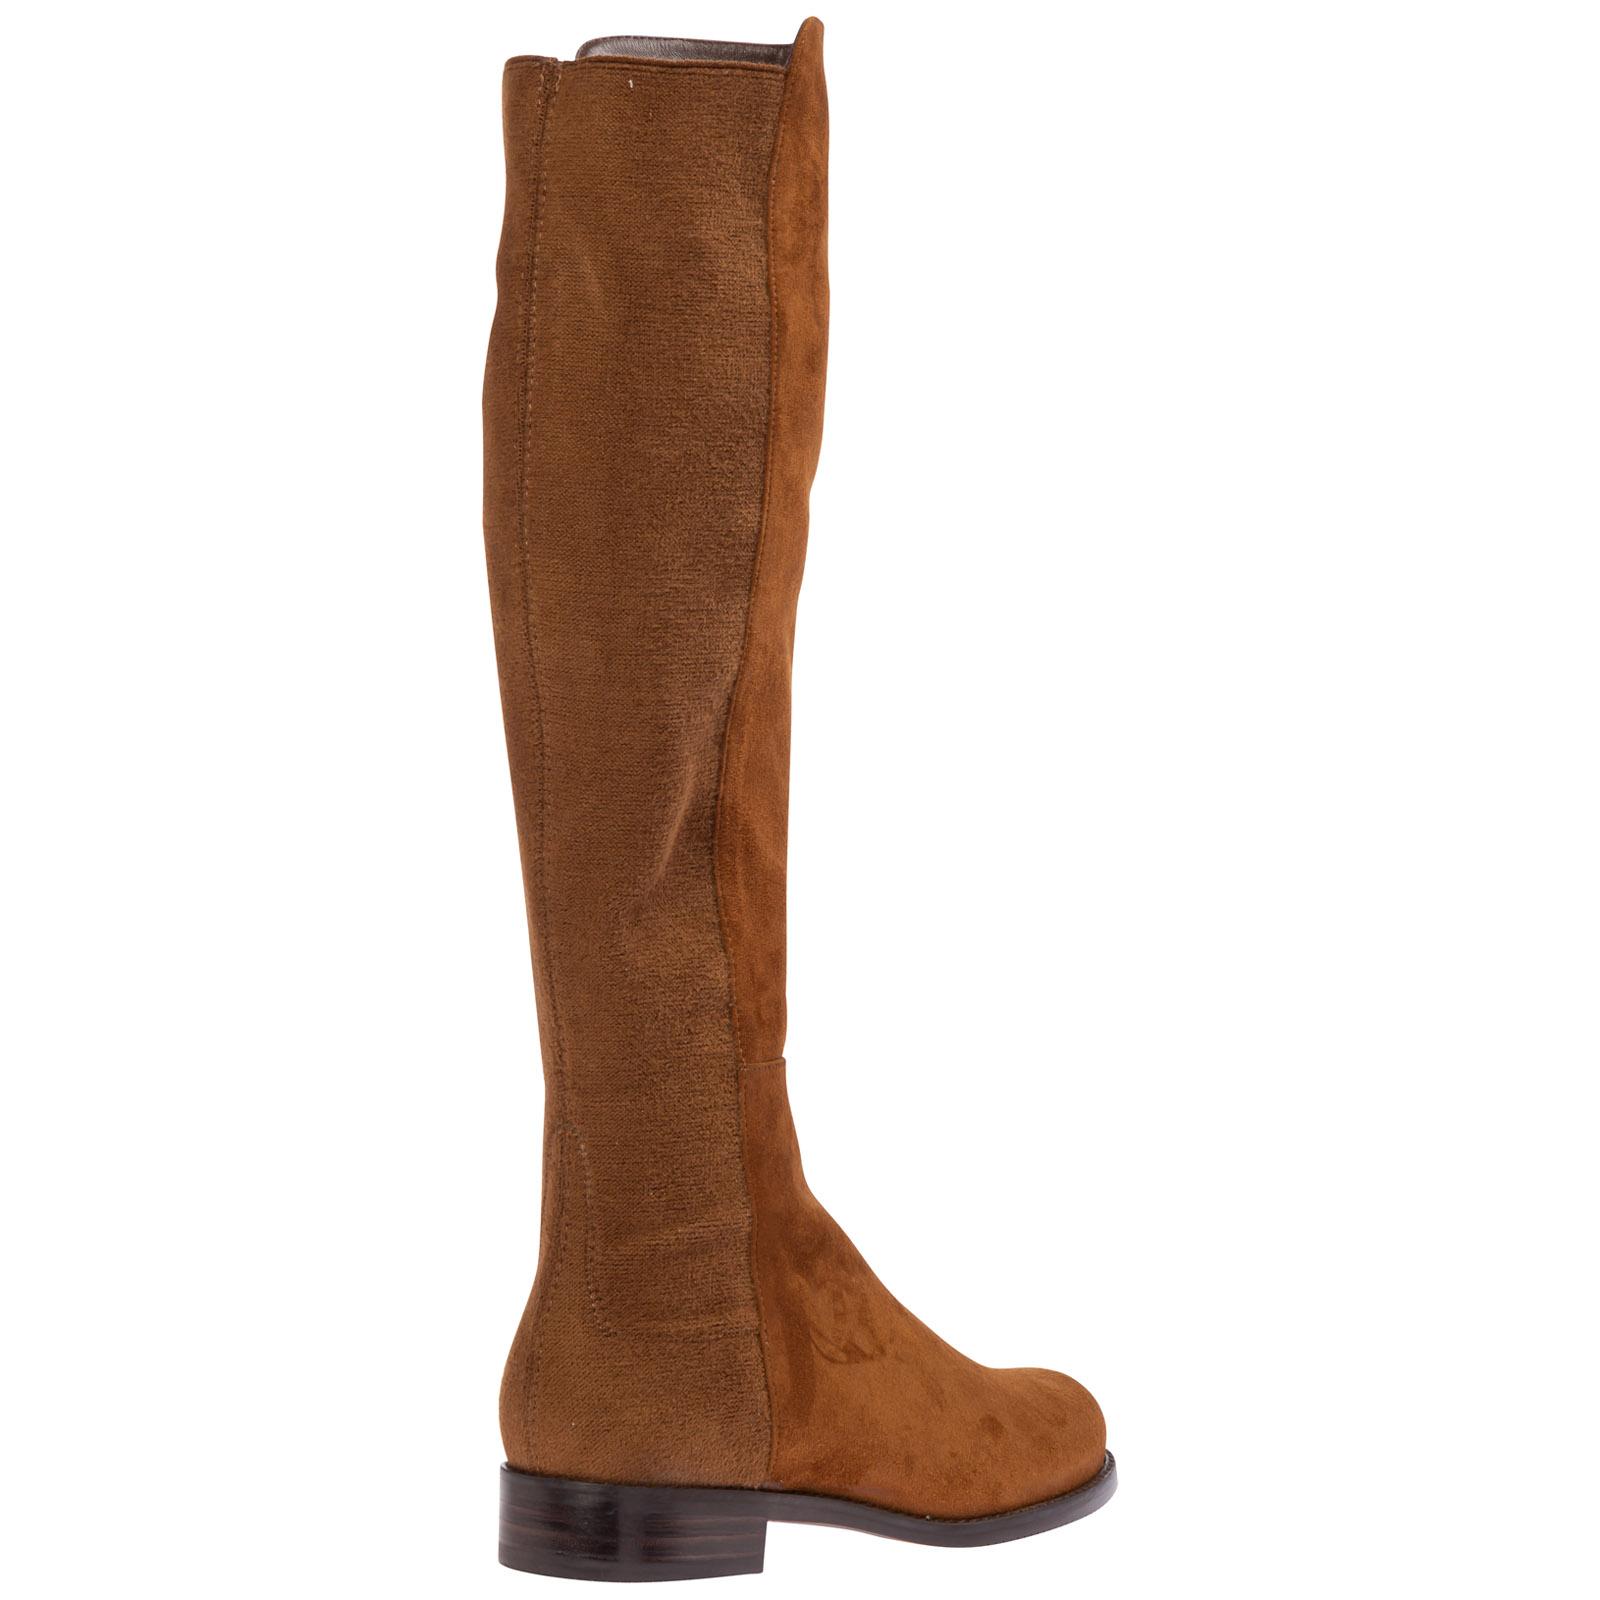 Knee high boots Stuart Weitzman